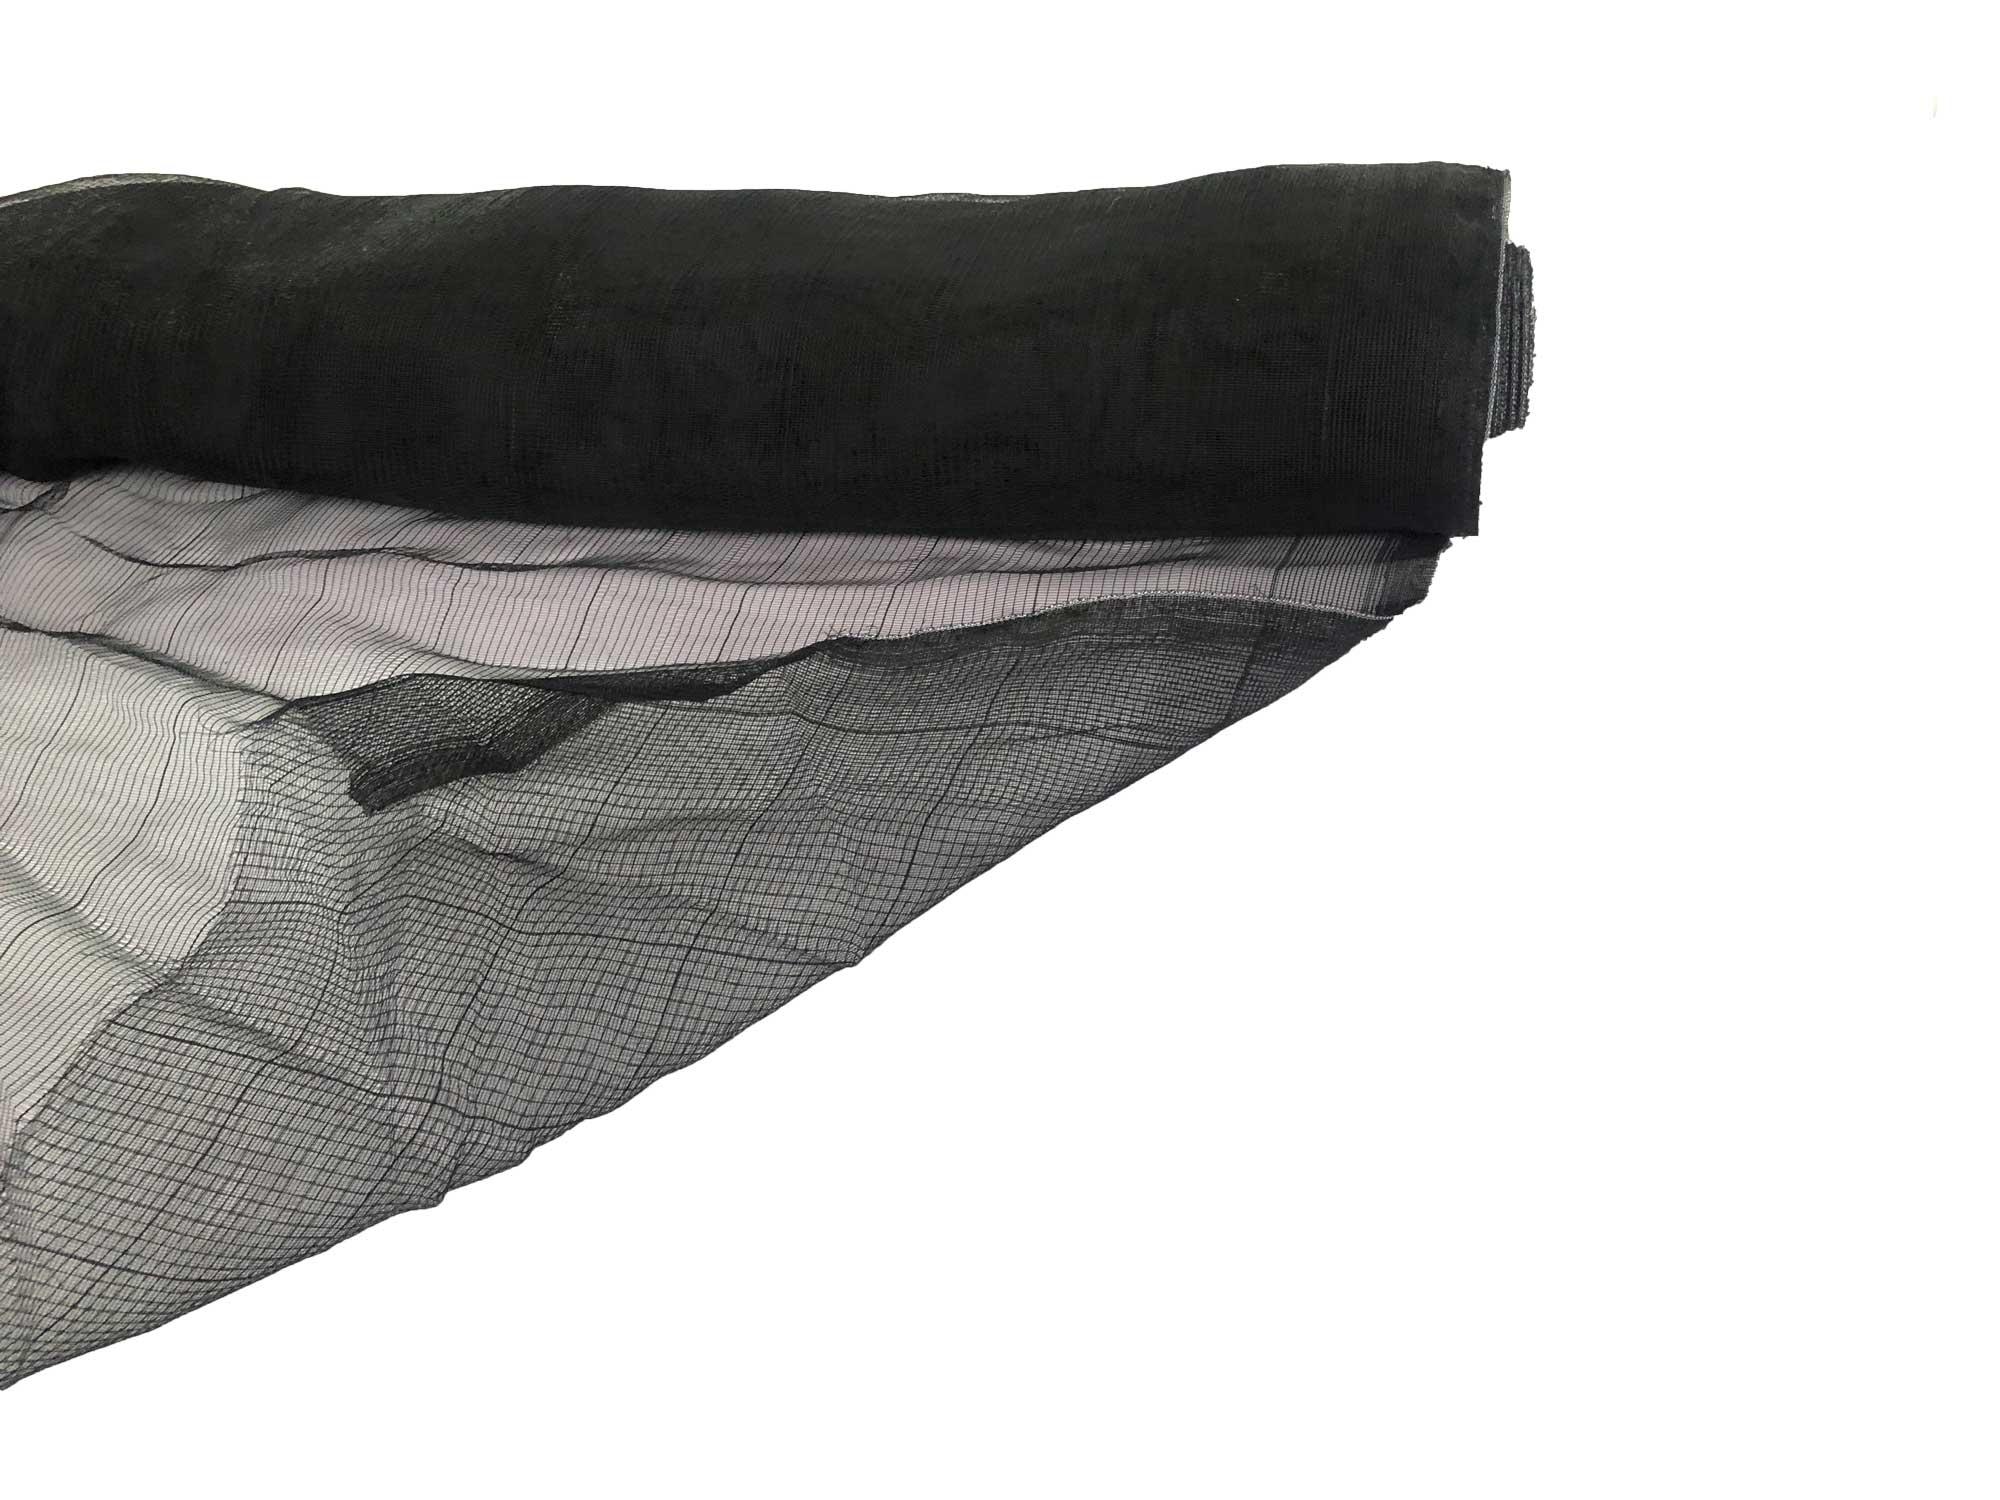 Tela Sombrite Nylon Monofilamento com Giro Inglês 50% 3x45